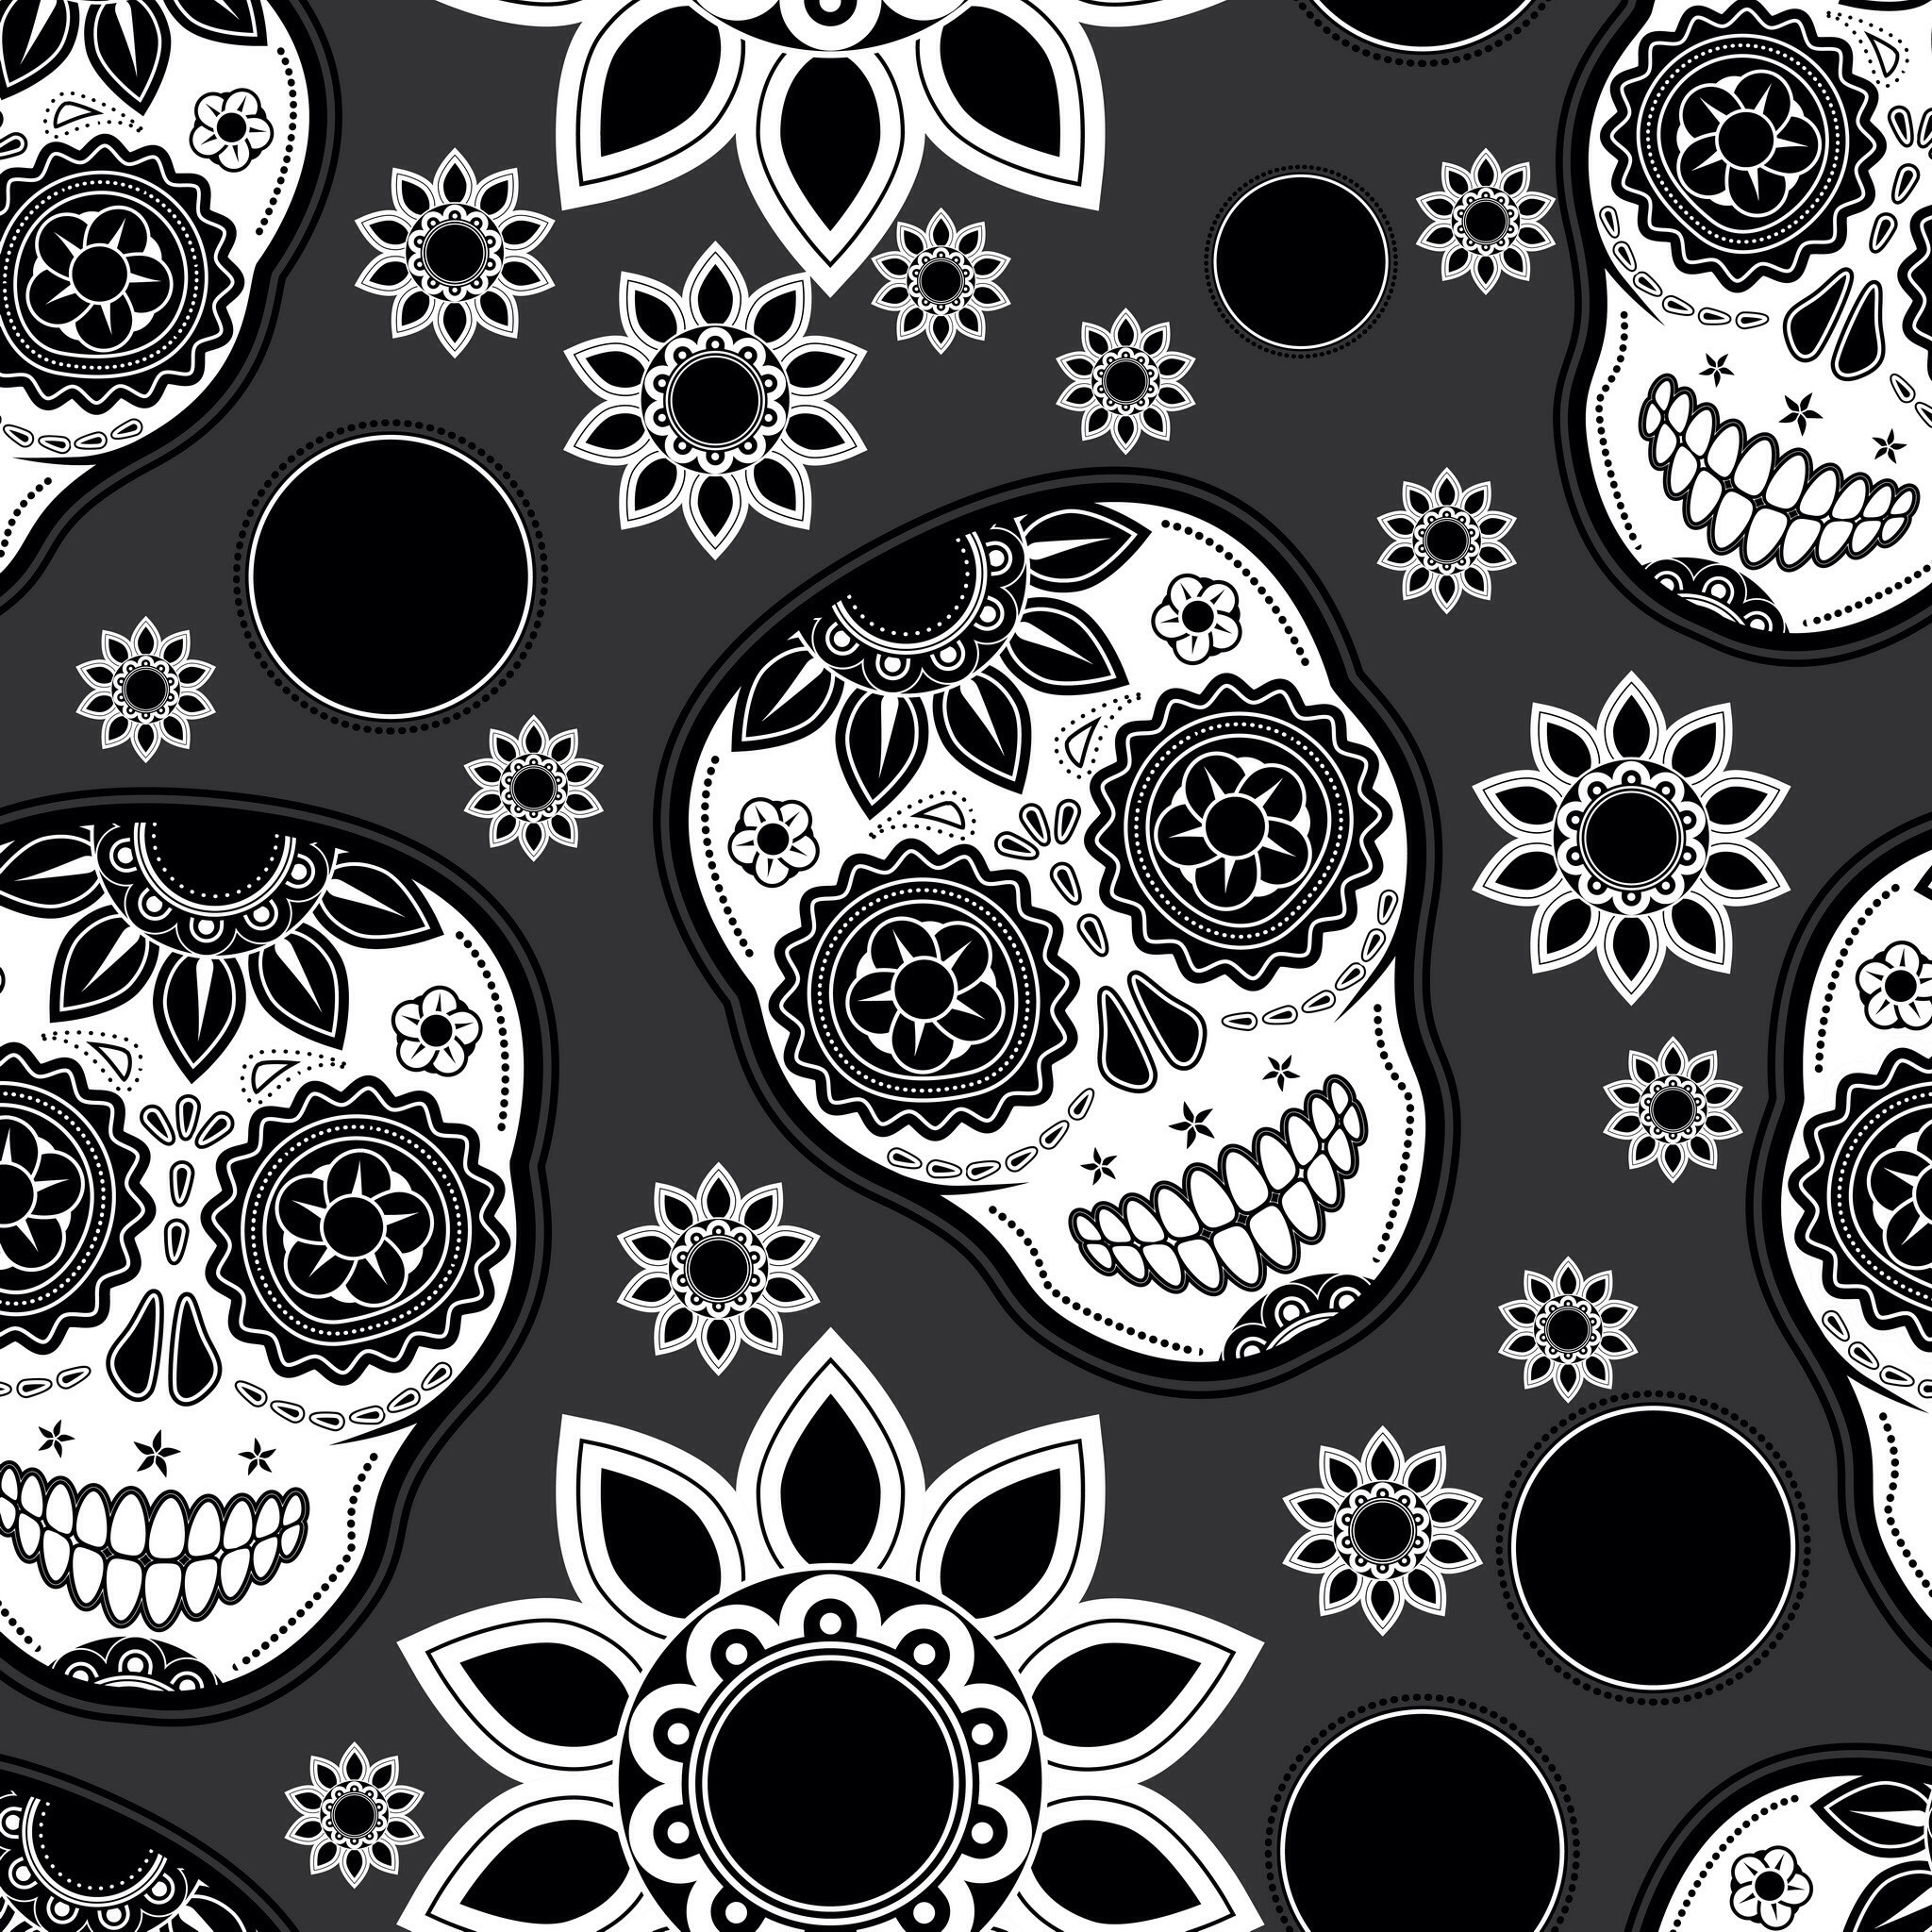 Explore Sugar Skull Wallpaper, Wallpaper For, and more!